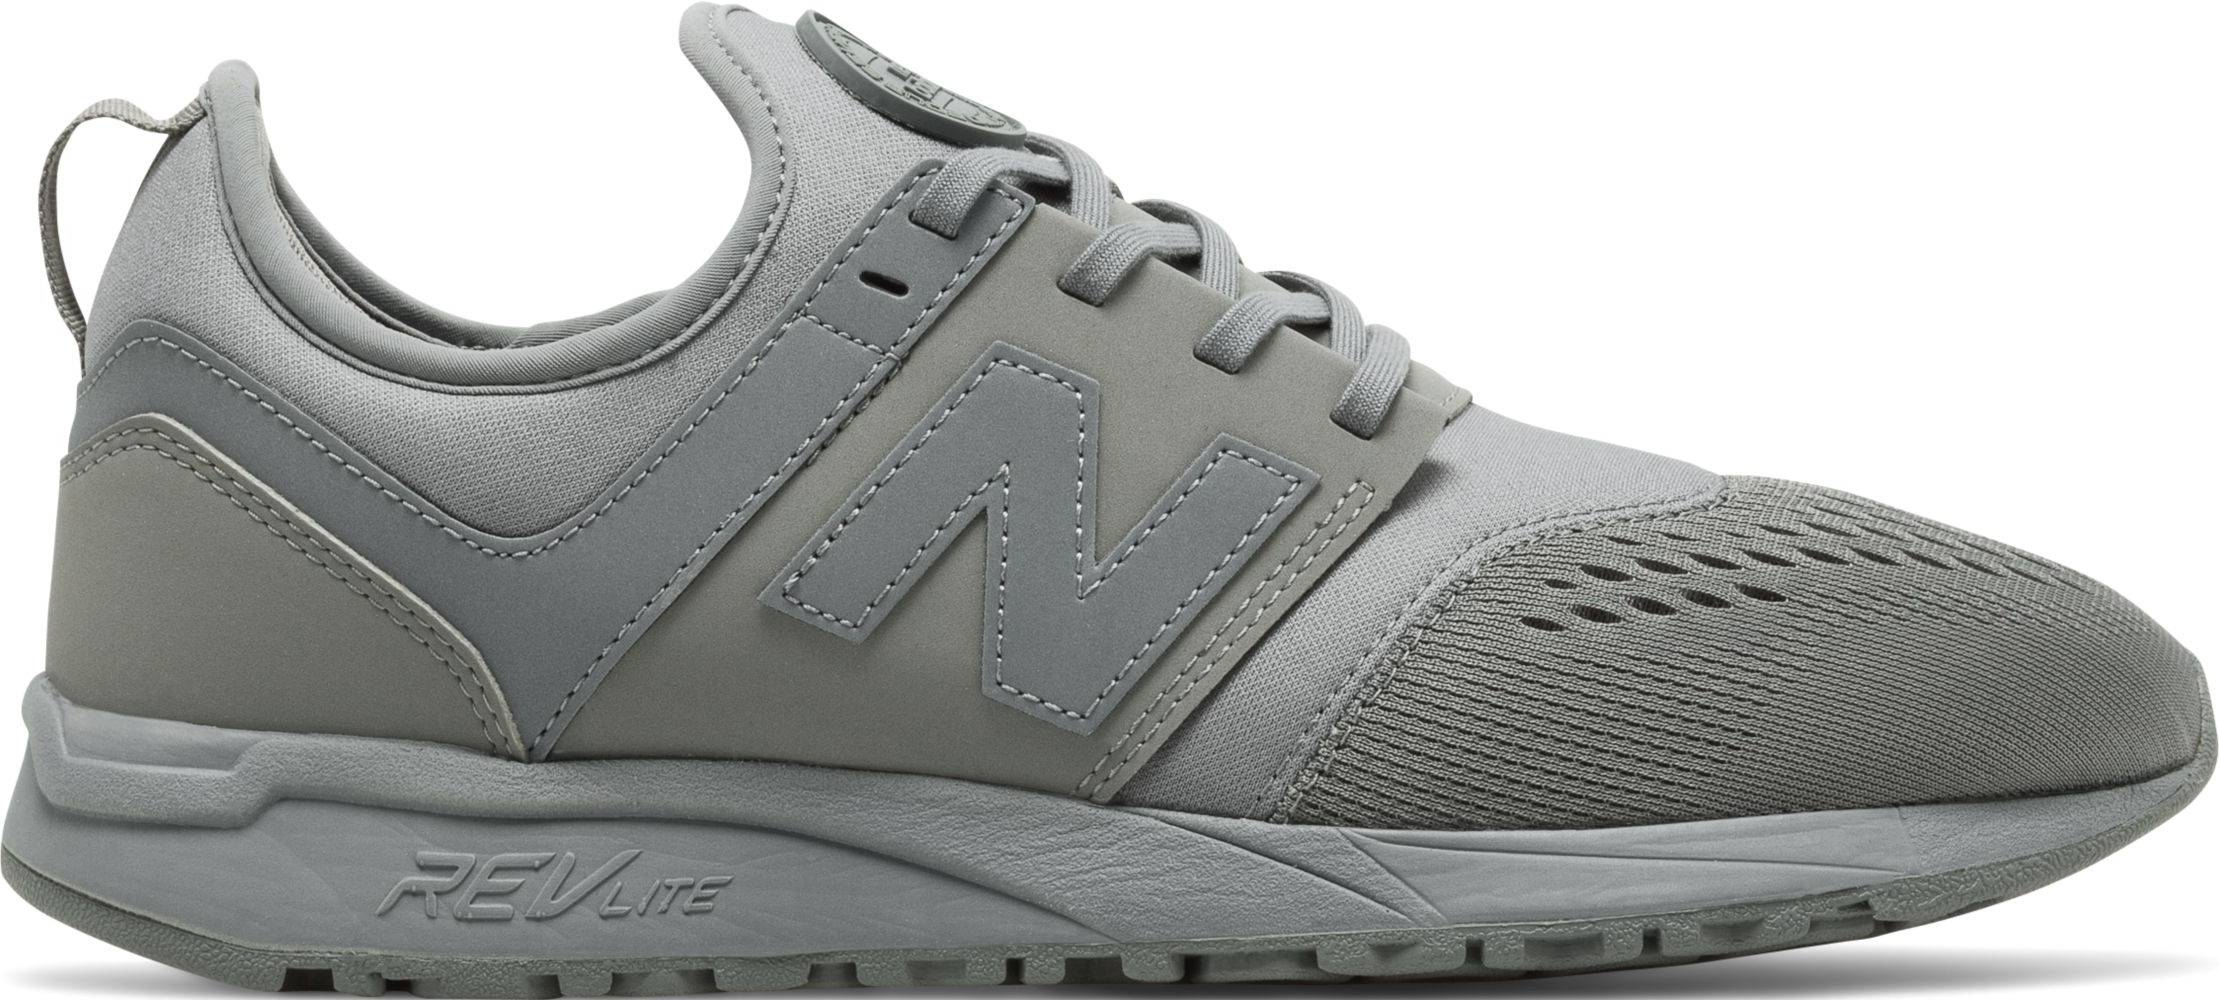 declarar calendario Permanentemente  New Balance 247 Sport sneakers in green + grey (only $67) | RunRepeat